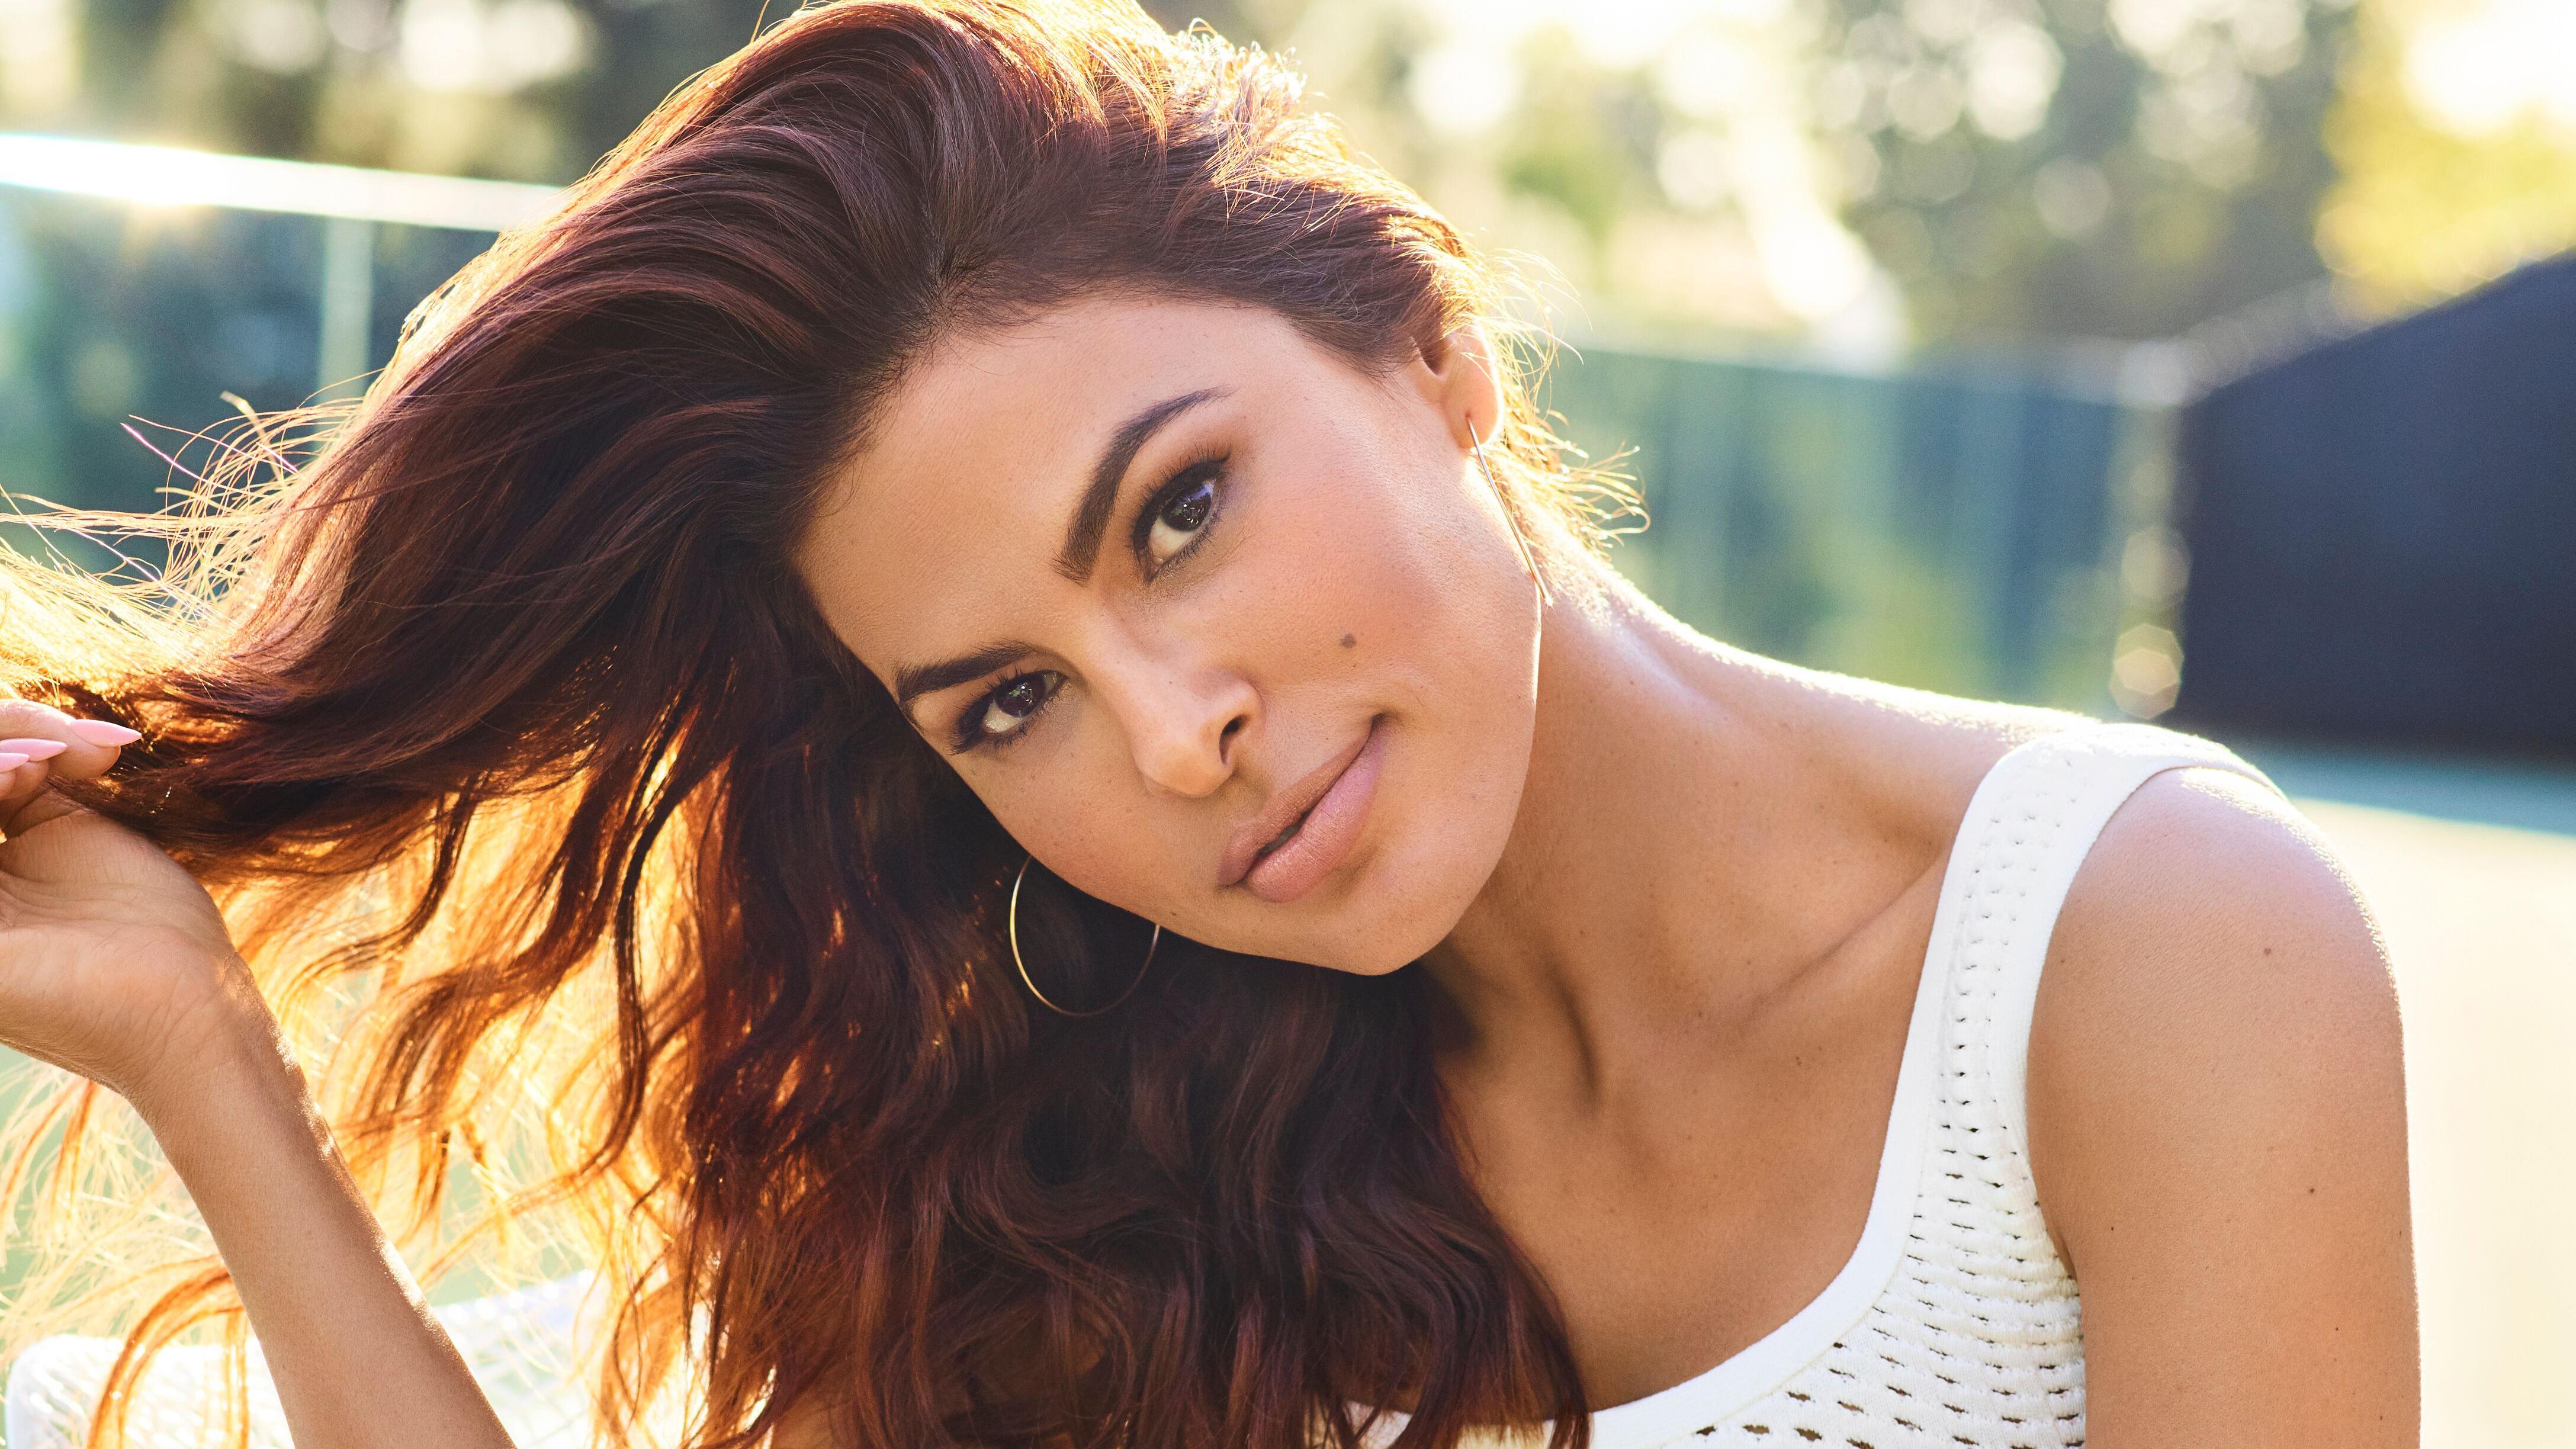 Eva Mendes Womens Health 2019 4k, HD Celebrities, 4k ...